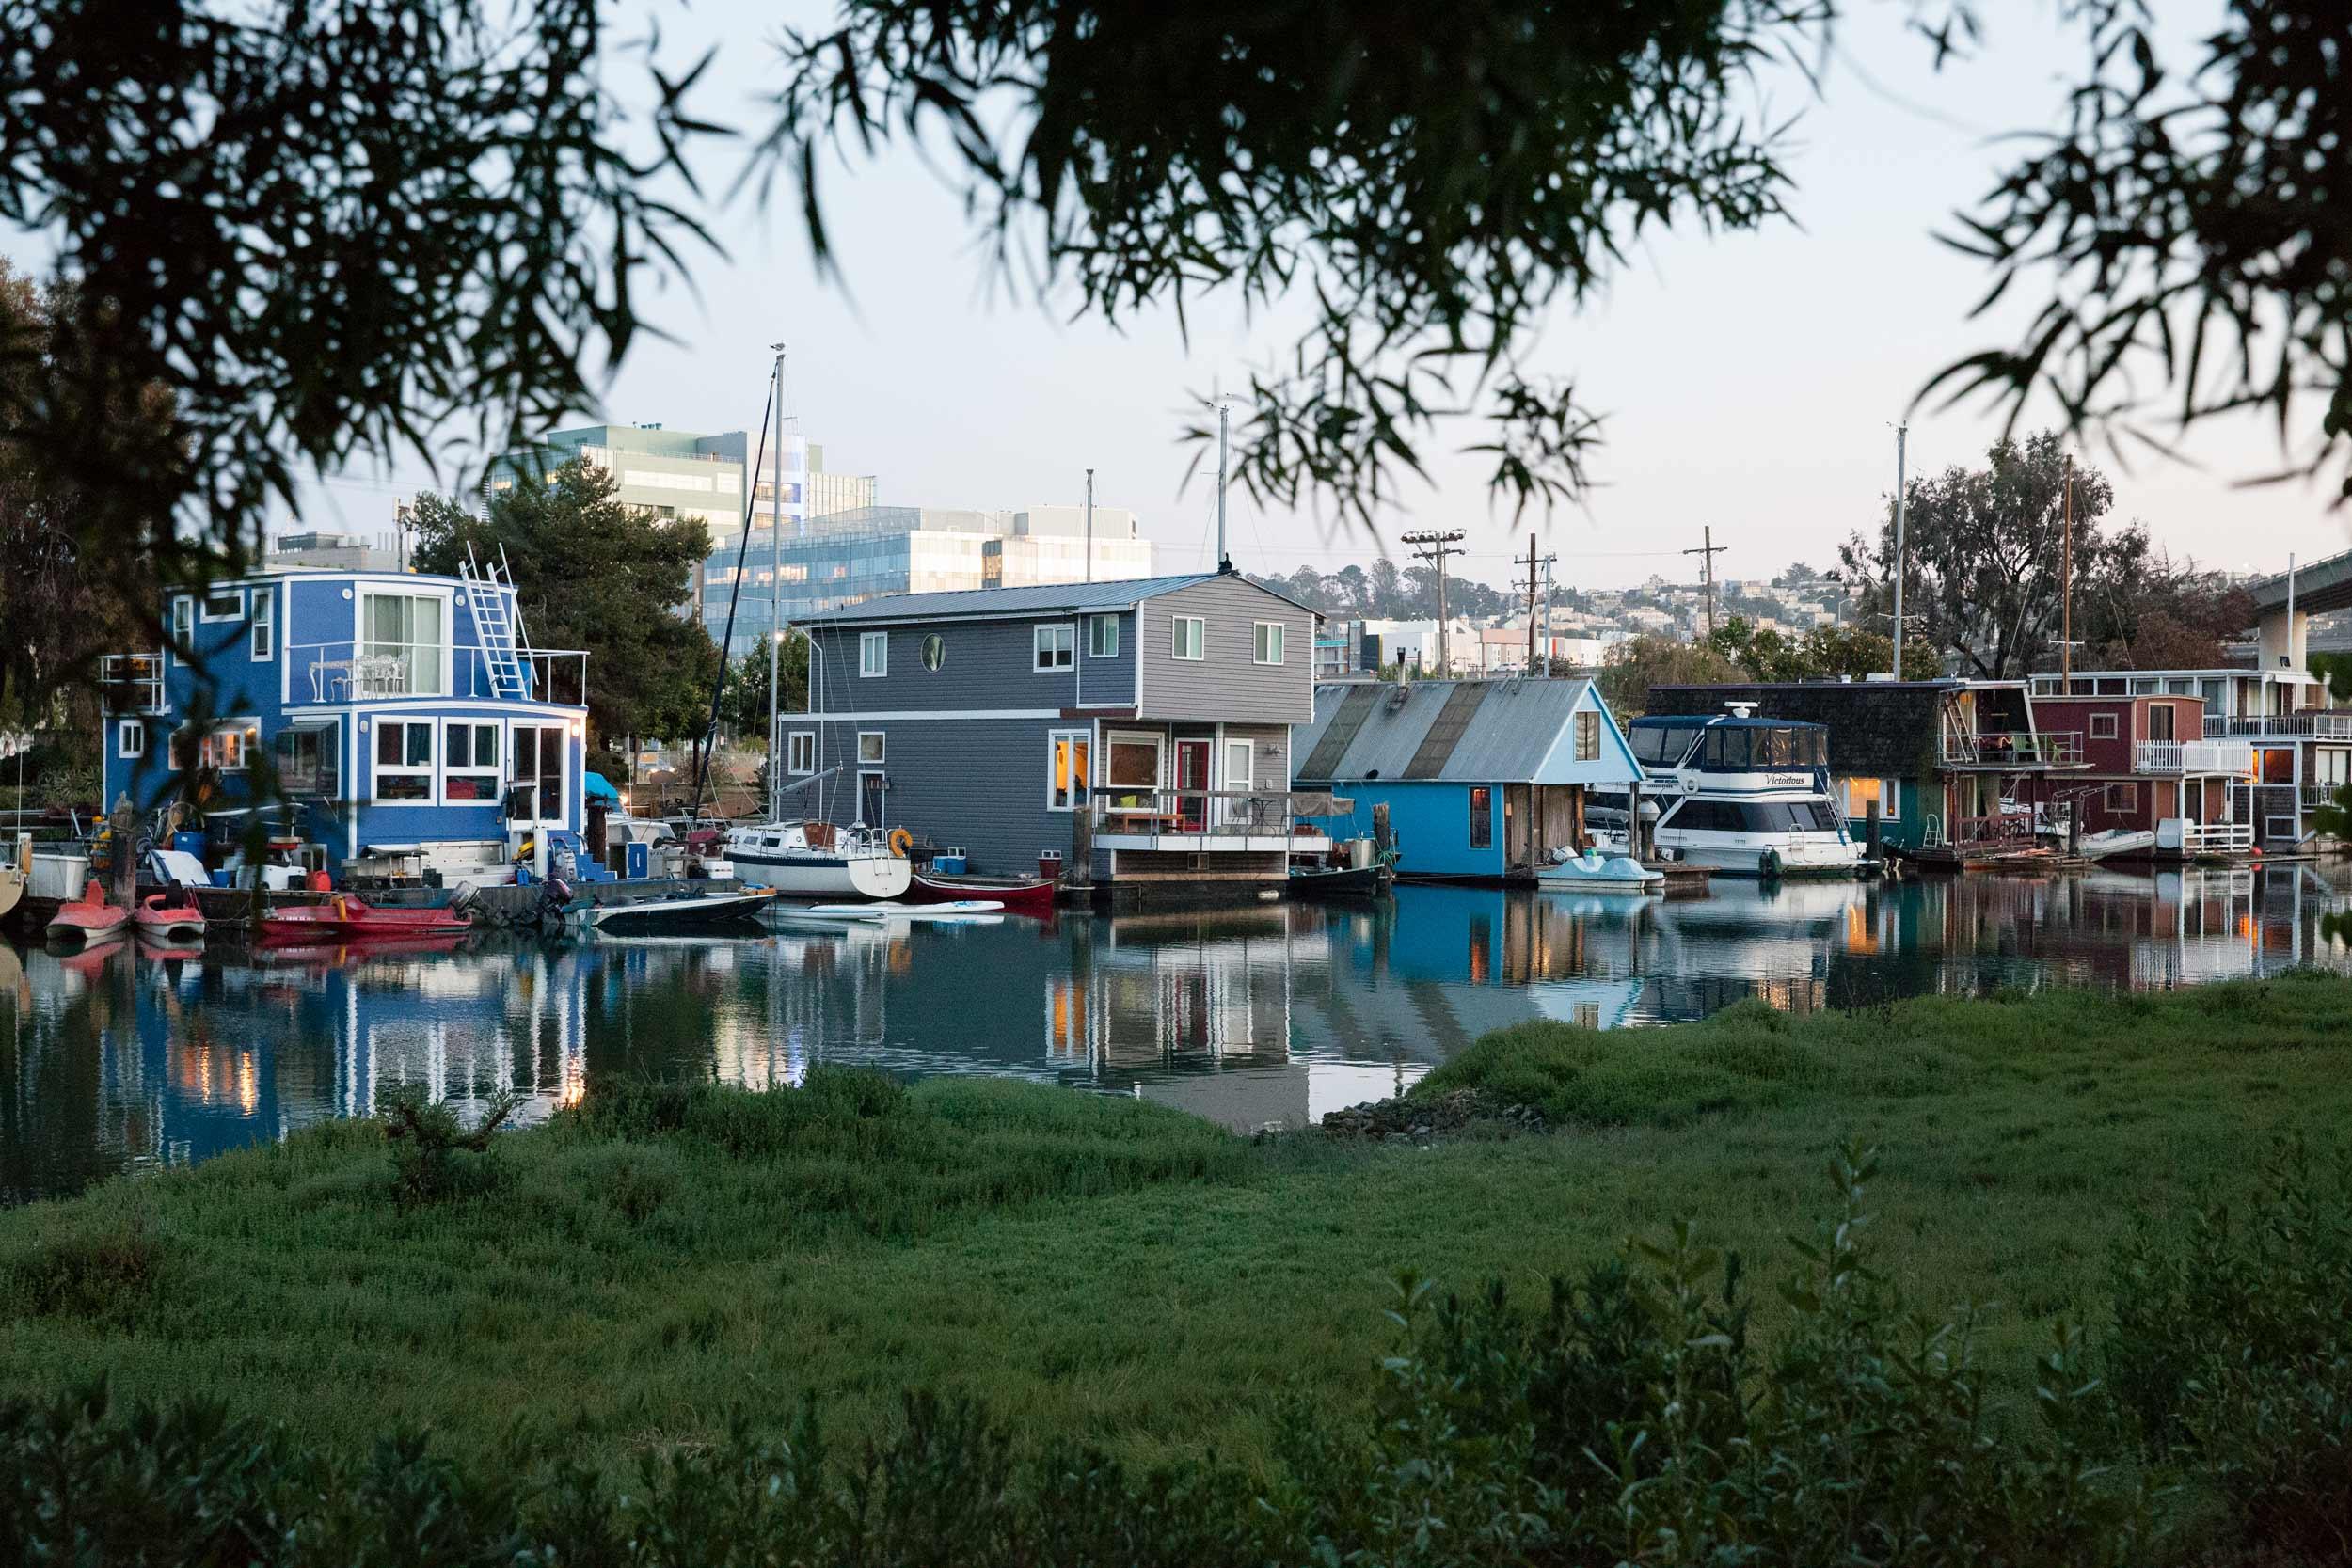 Houseboats-view-MissionCreek-SF.jpg